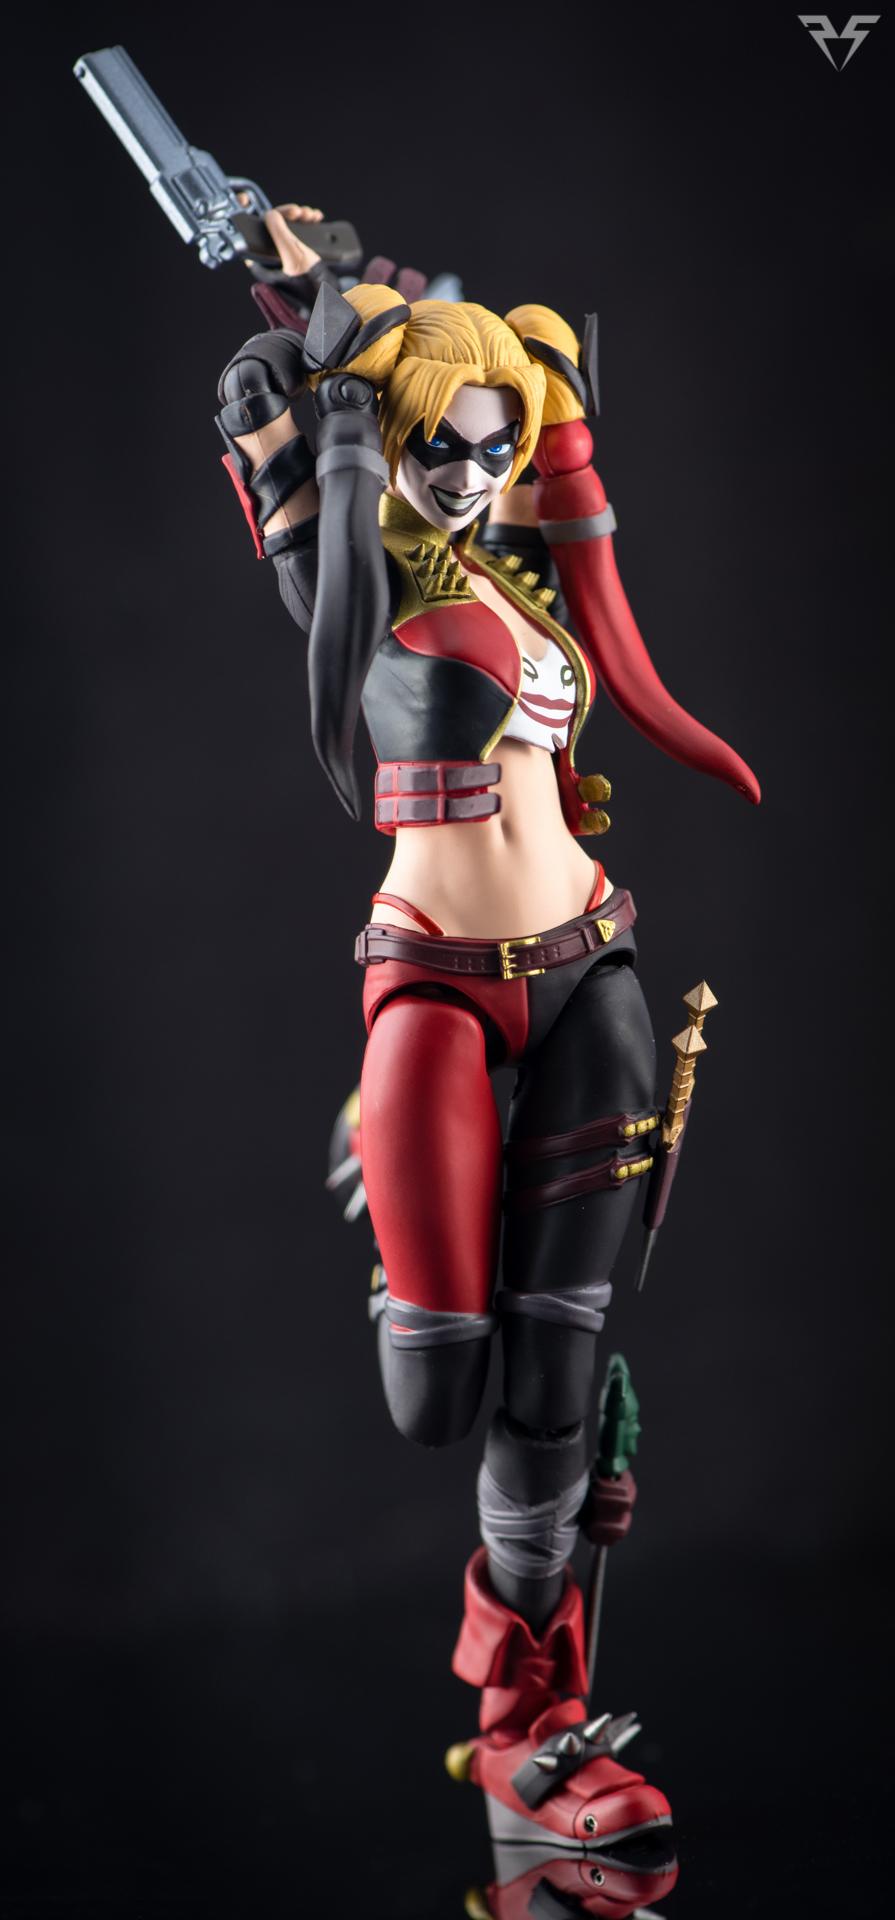 Figuarts Harley Quinn-5.jpg